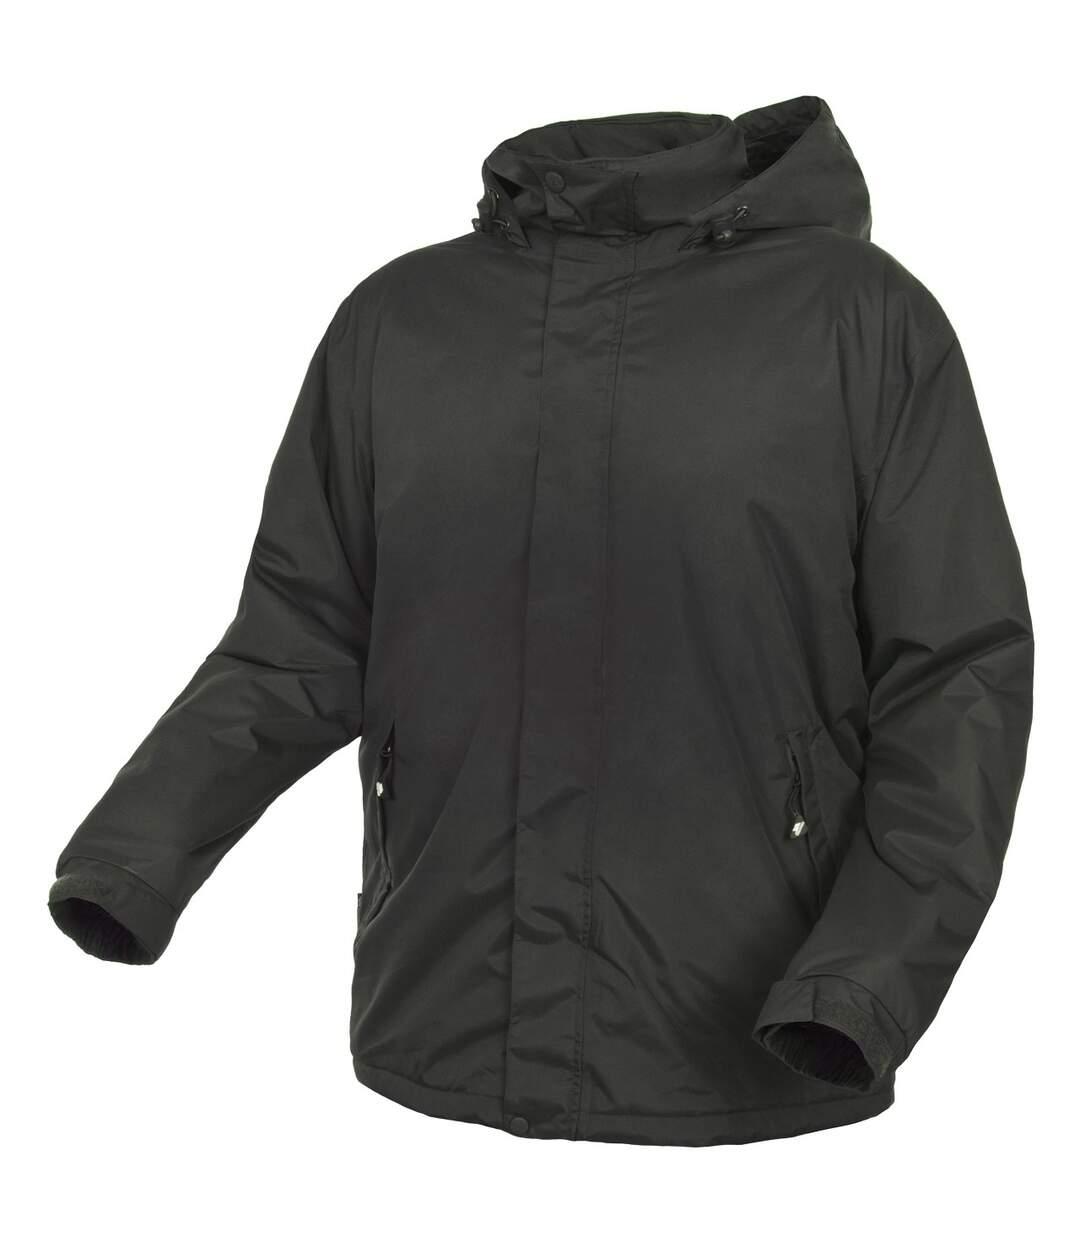 Trespass Mens Bayfield Hooded Touch Fastening Weatherproof Jacket (Khaki) - UTTP4541